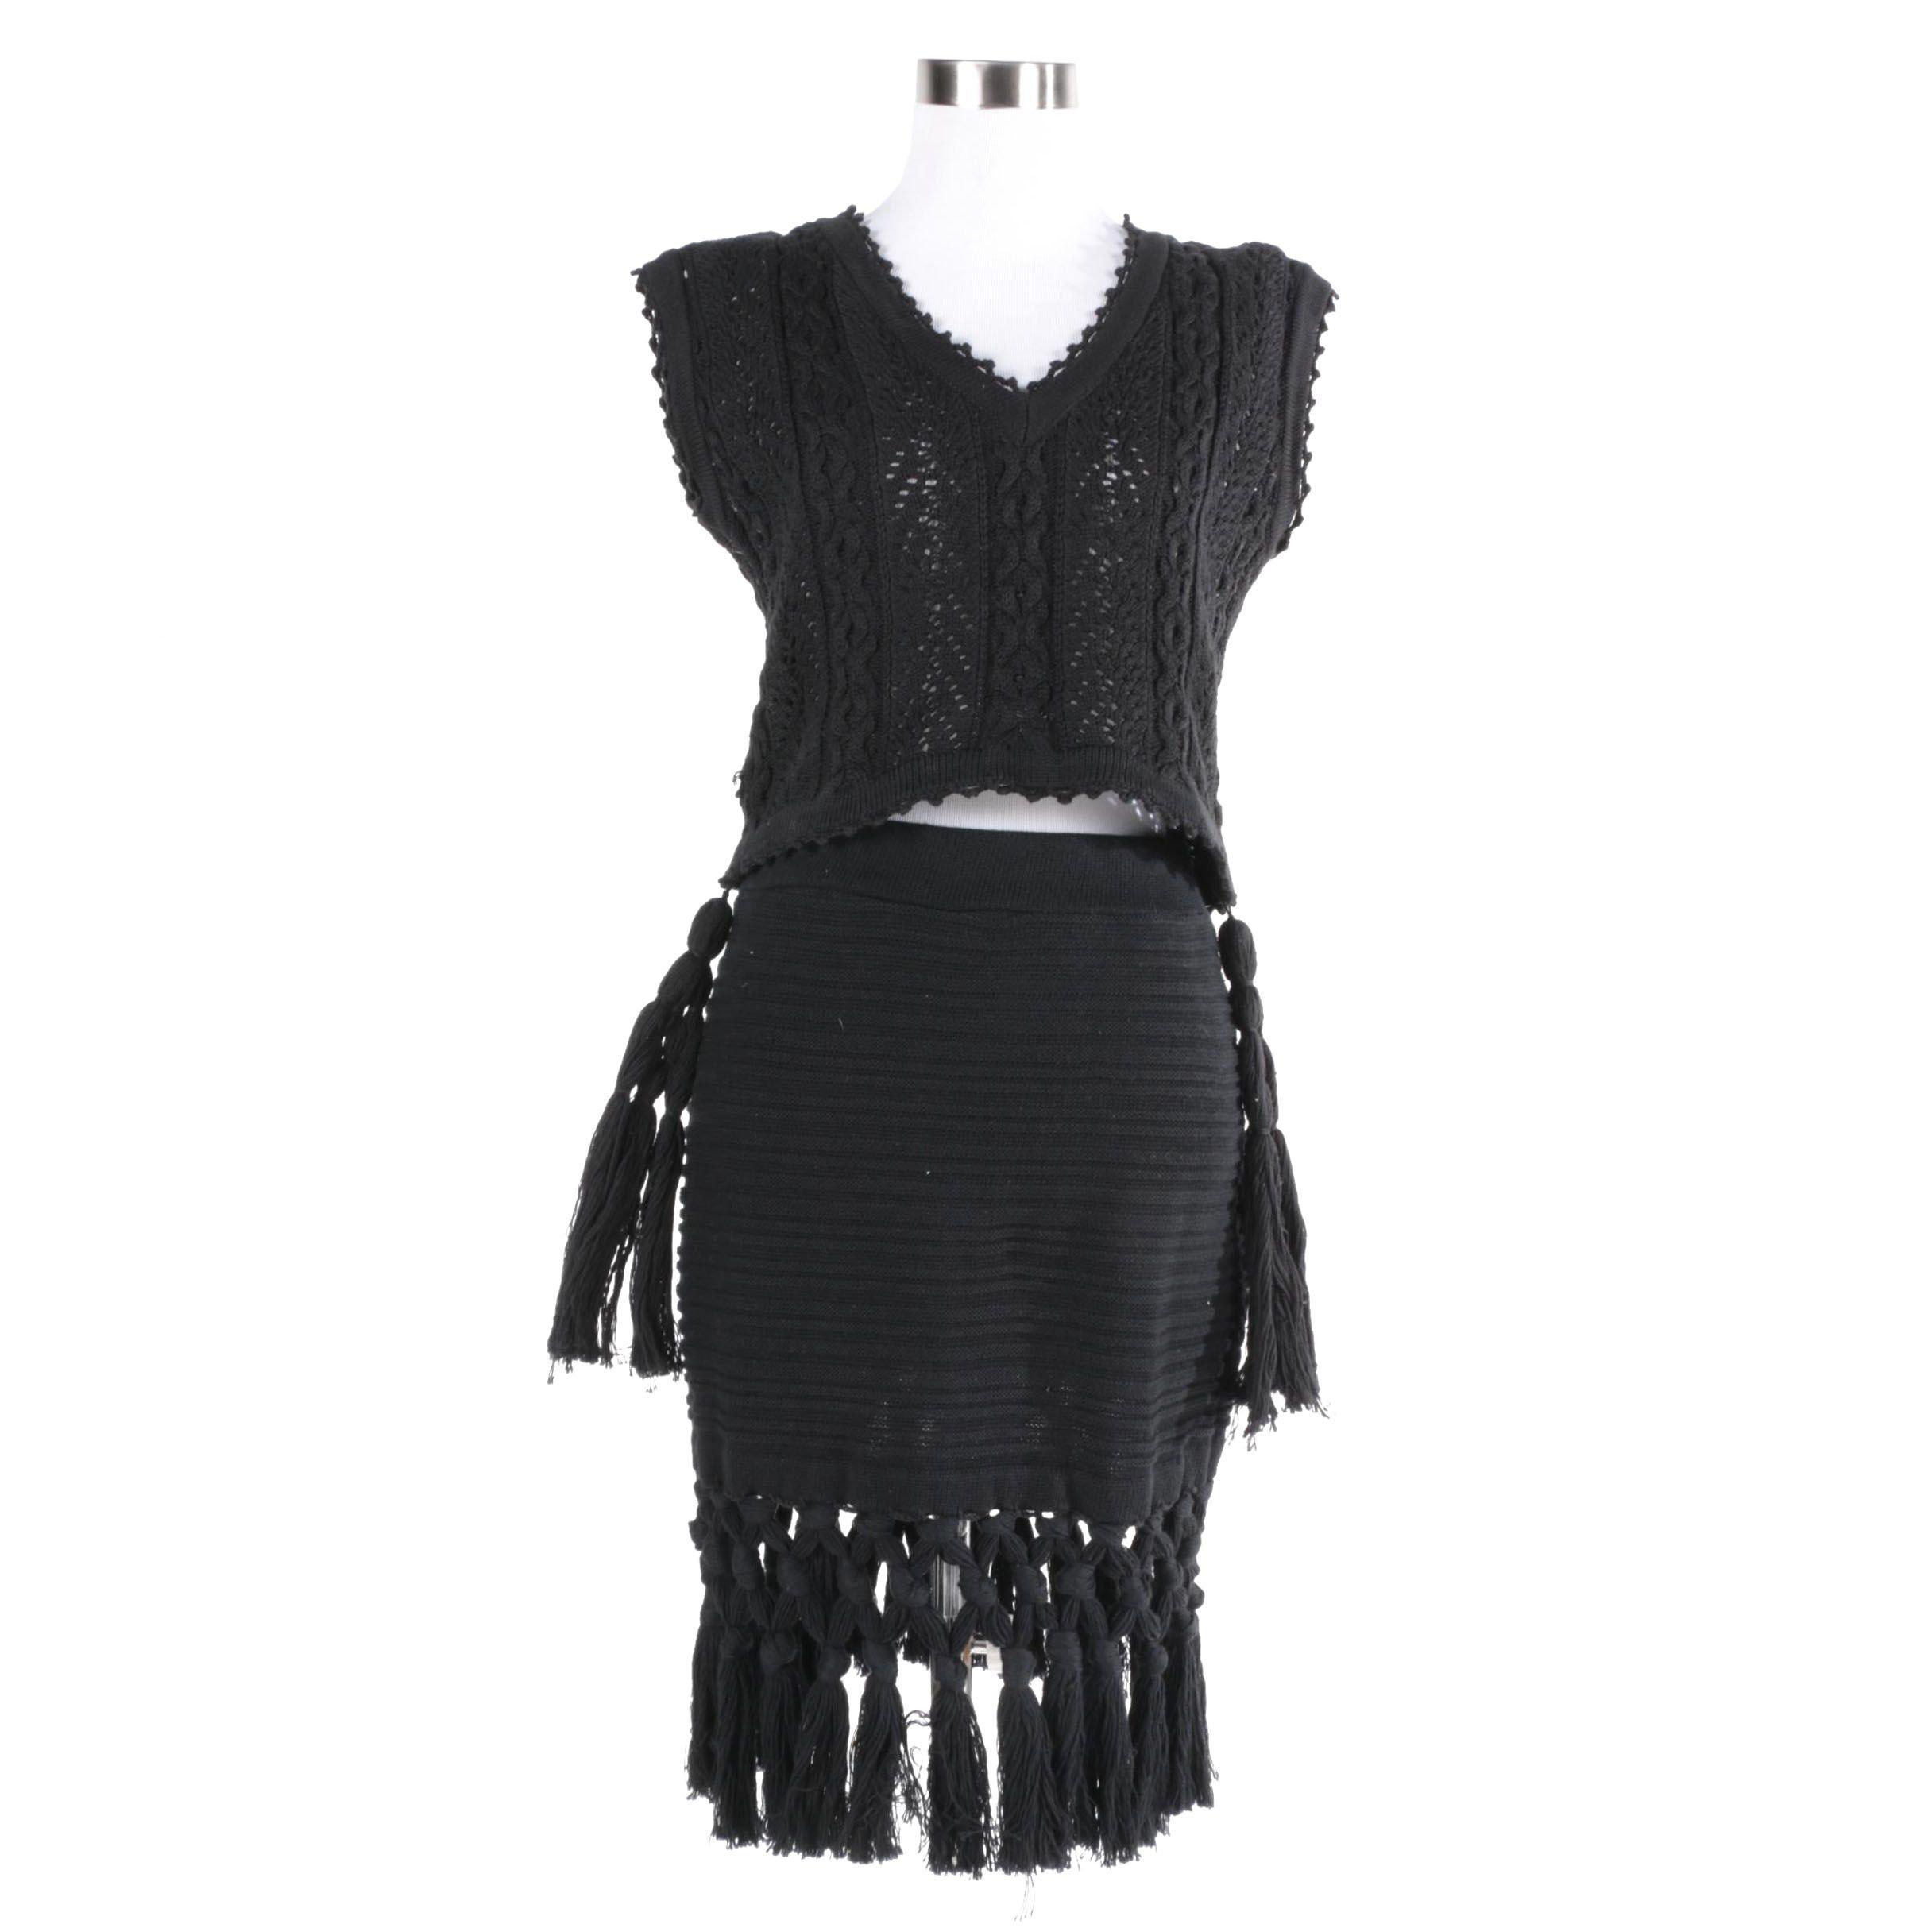 Women's Claude Barthelemy Paris Knit Top and Skirt